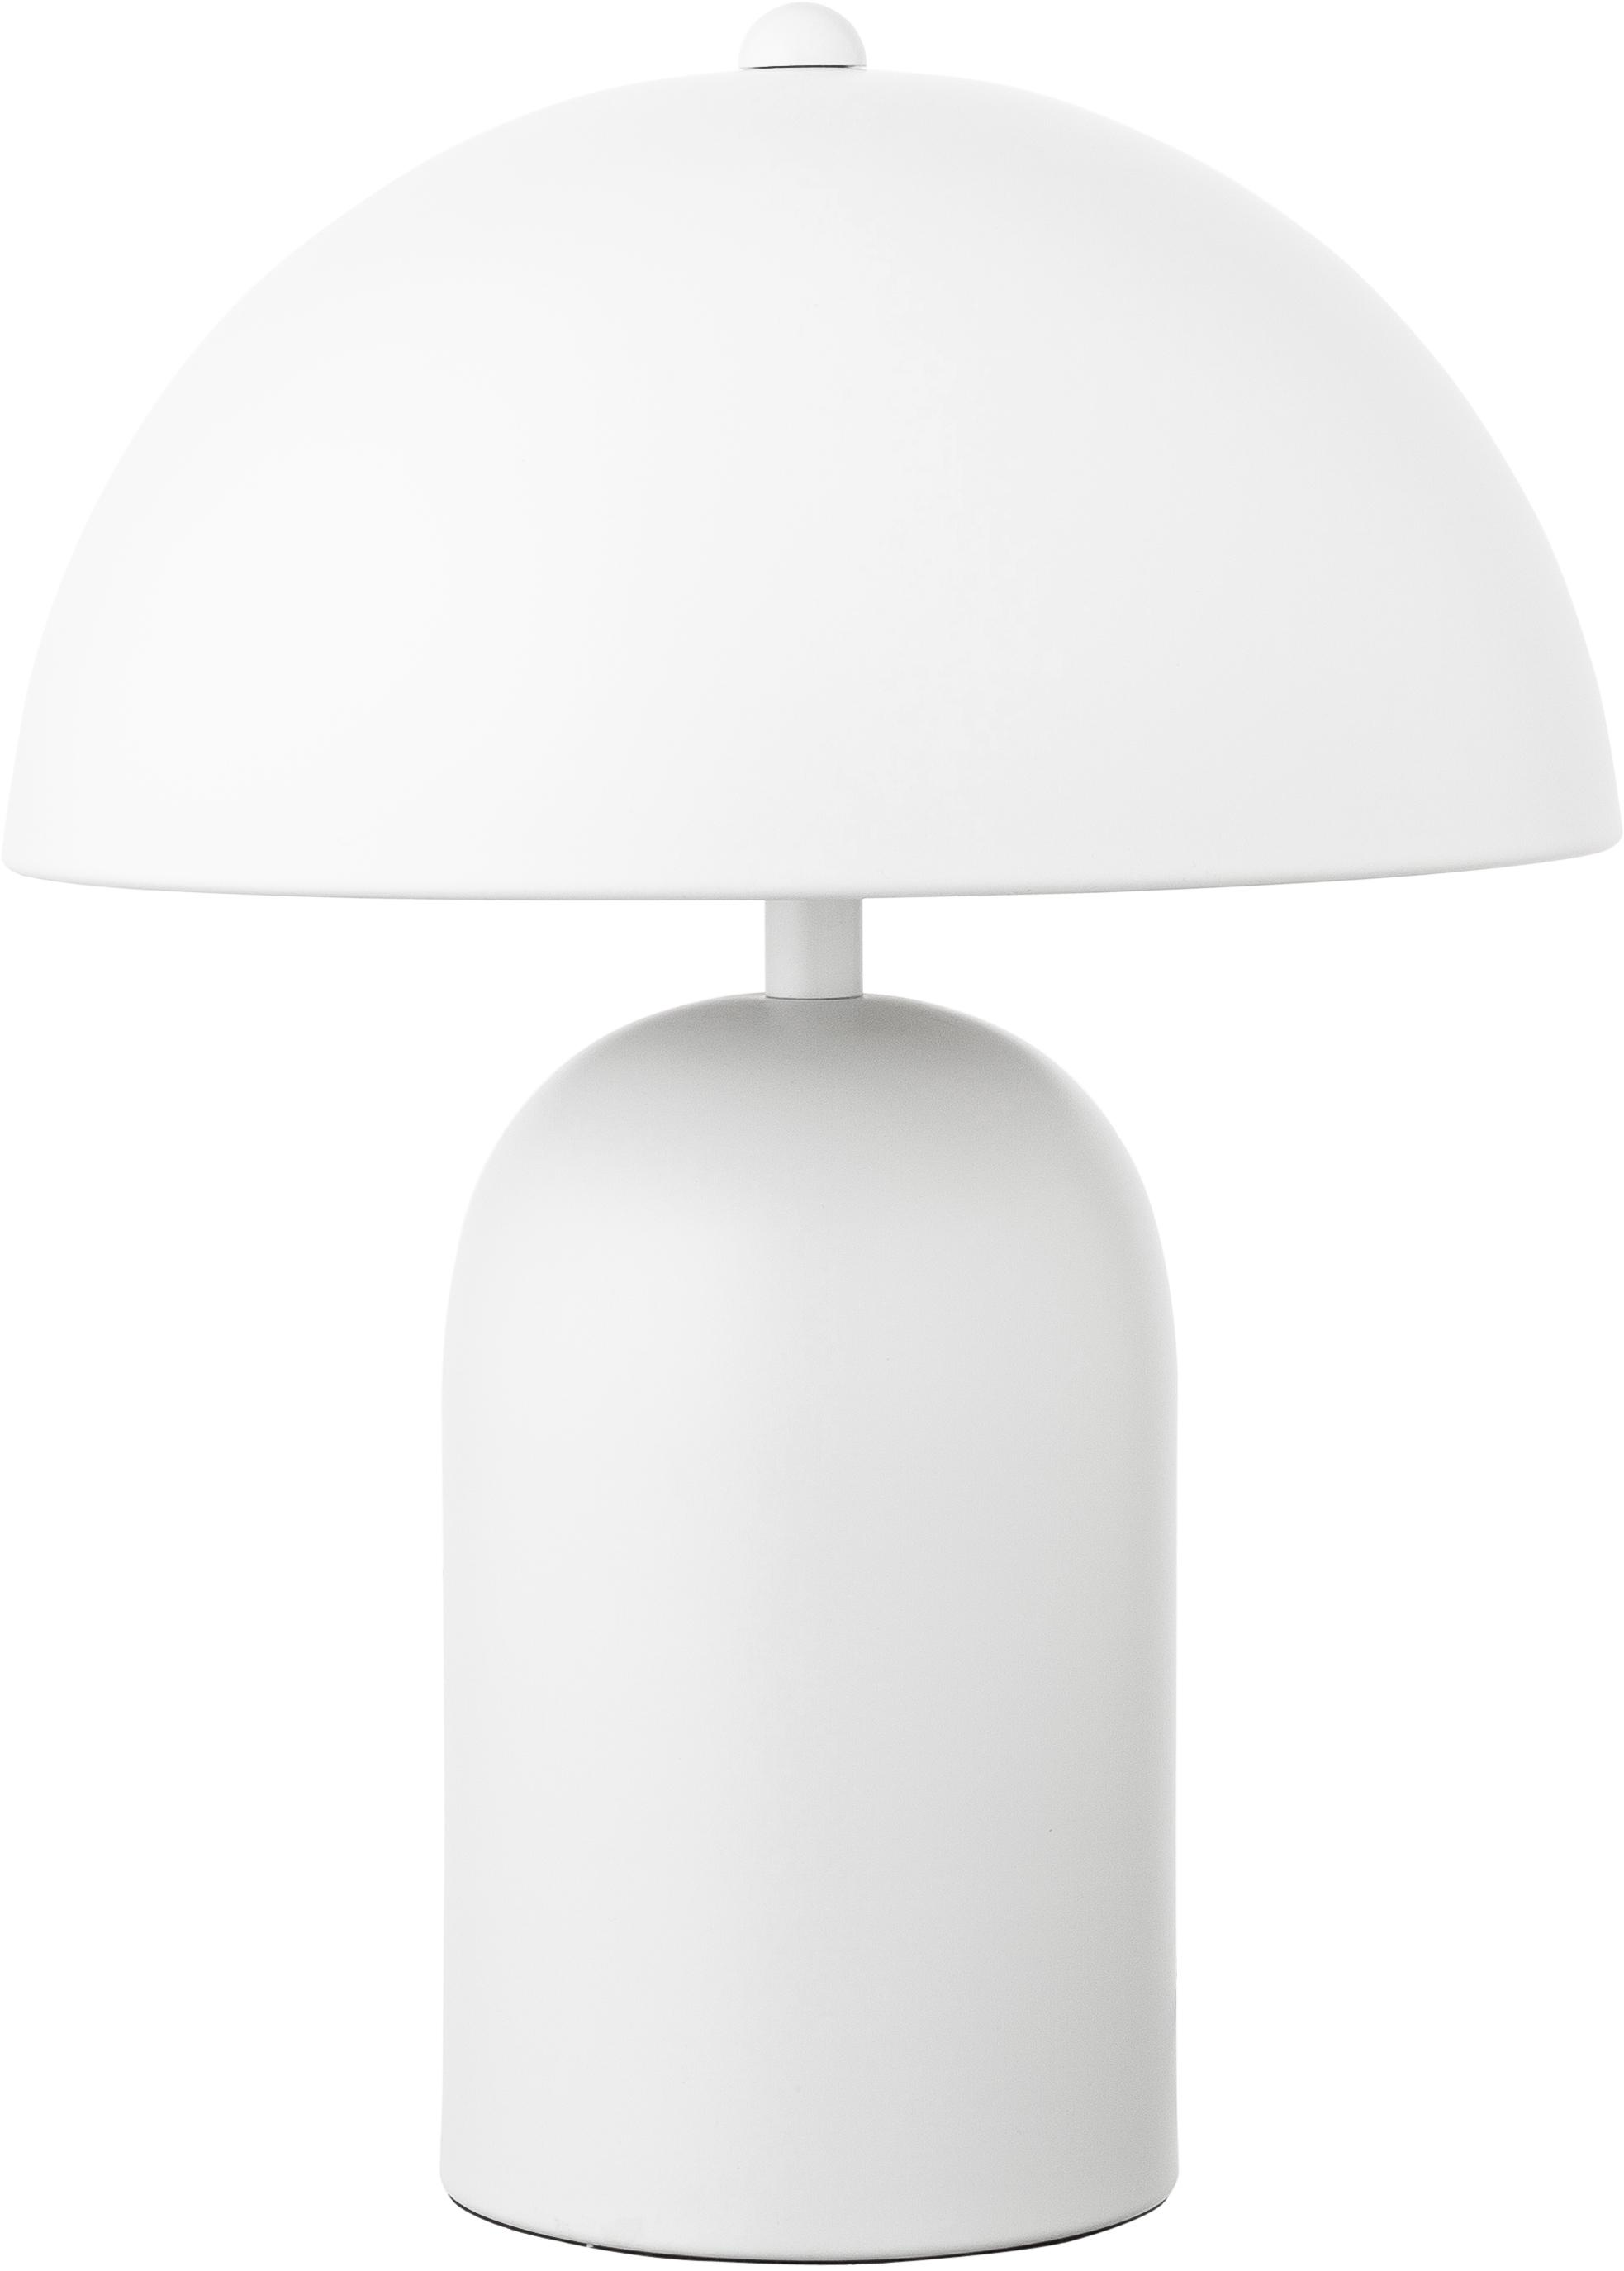 Retro-Tischlampe Walter, Lampenschirm: Metall, Lampenfuß: Metall, Mattweiß, Ø 25 x H 33 cm